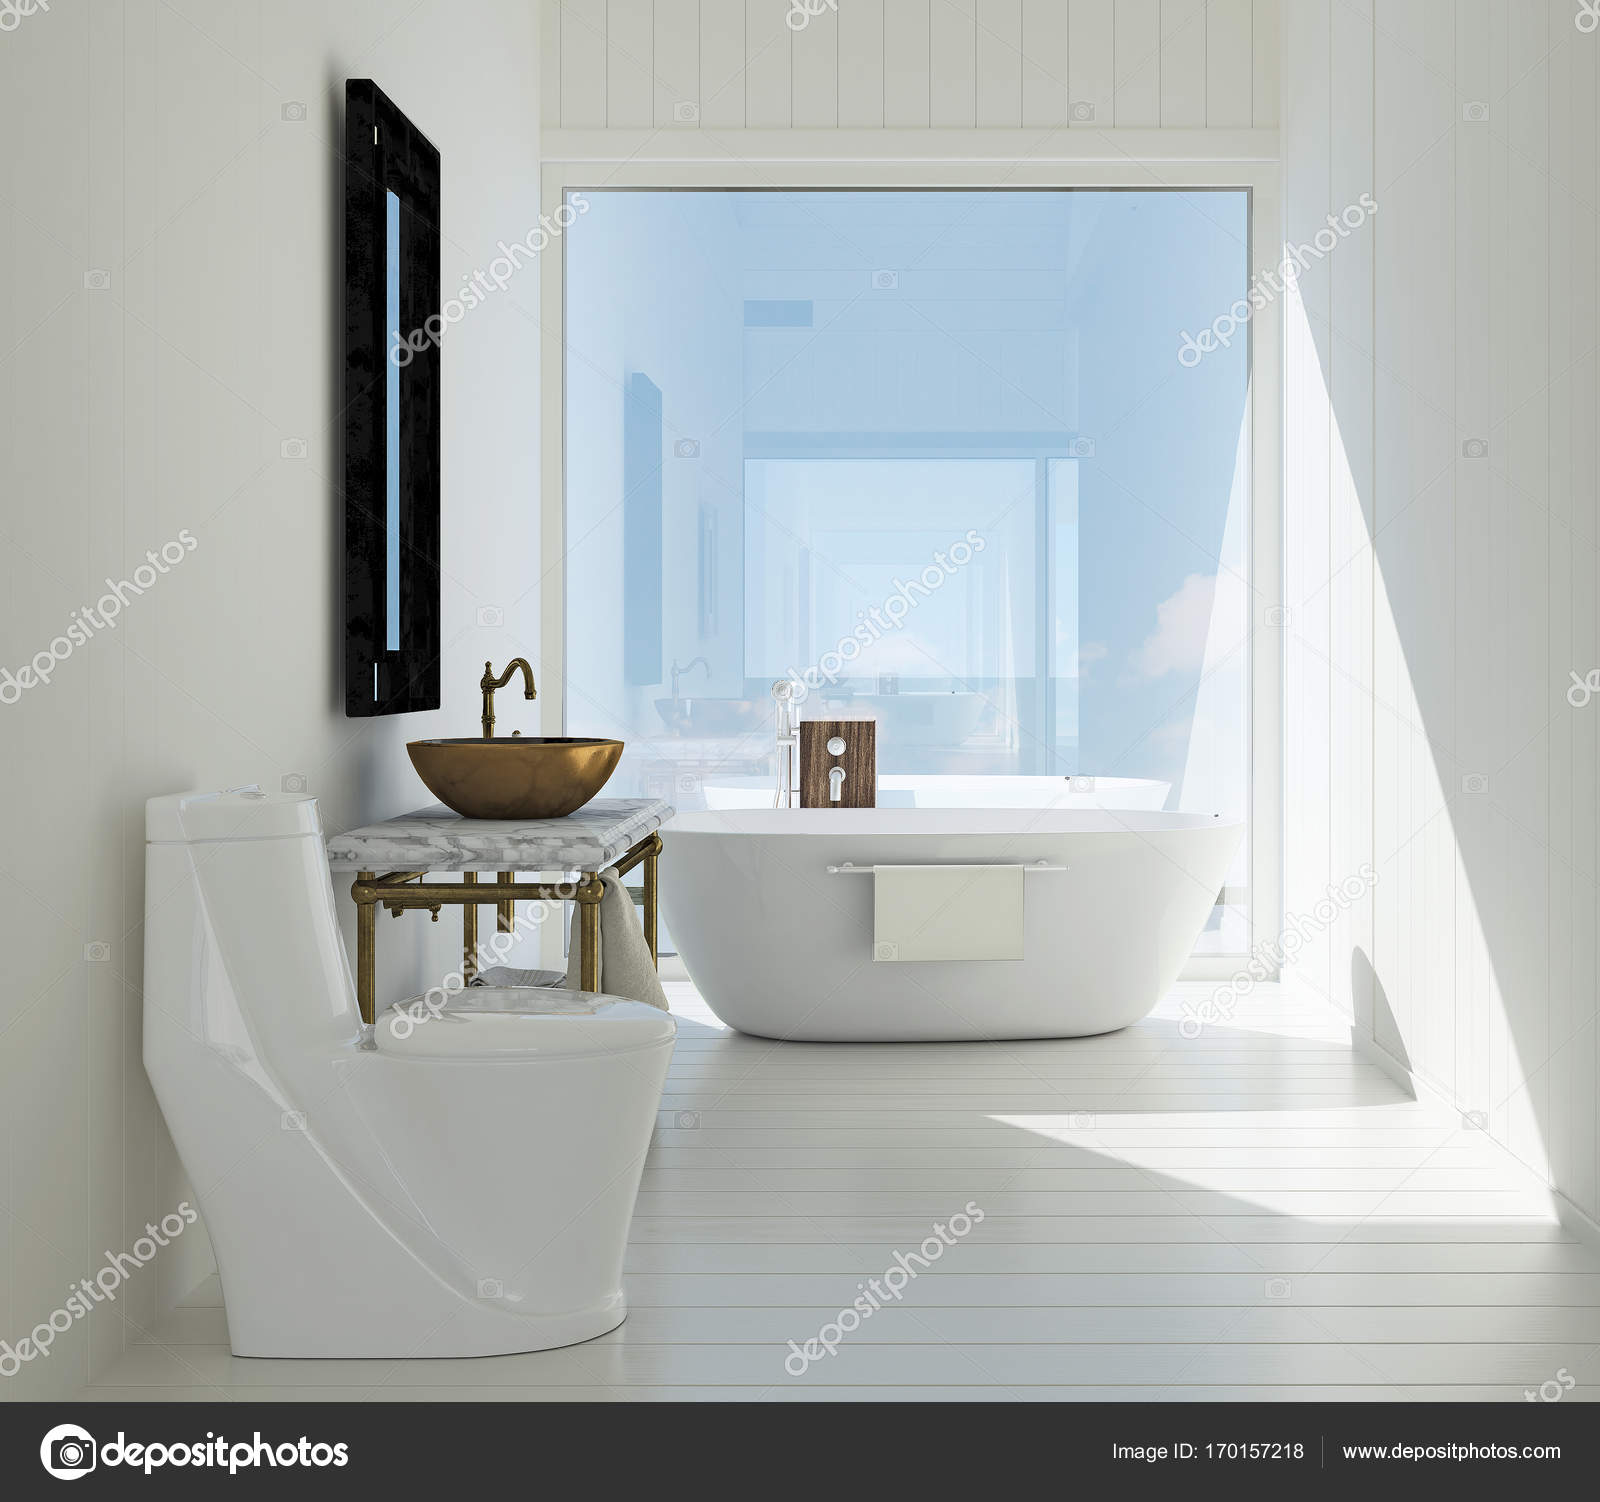 https://st3.depositphotos.com/11732771/17015/i/1600/depositphotos_170157218-stockafbeelding-de-badkamer-interieur-en-beton.jpg